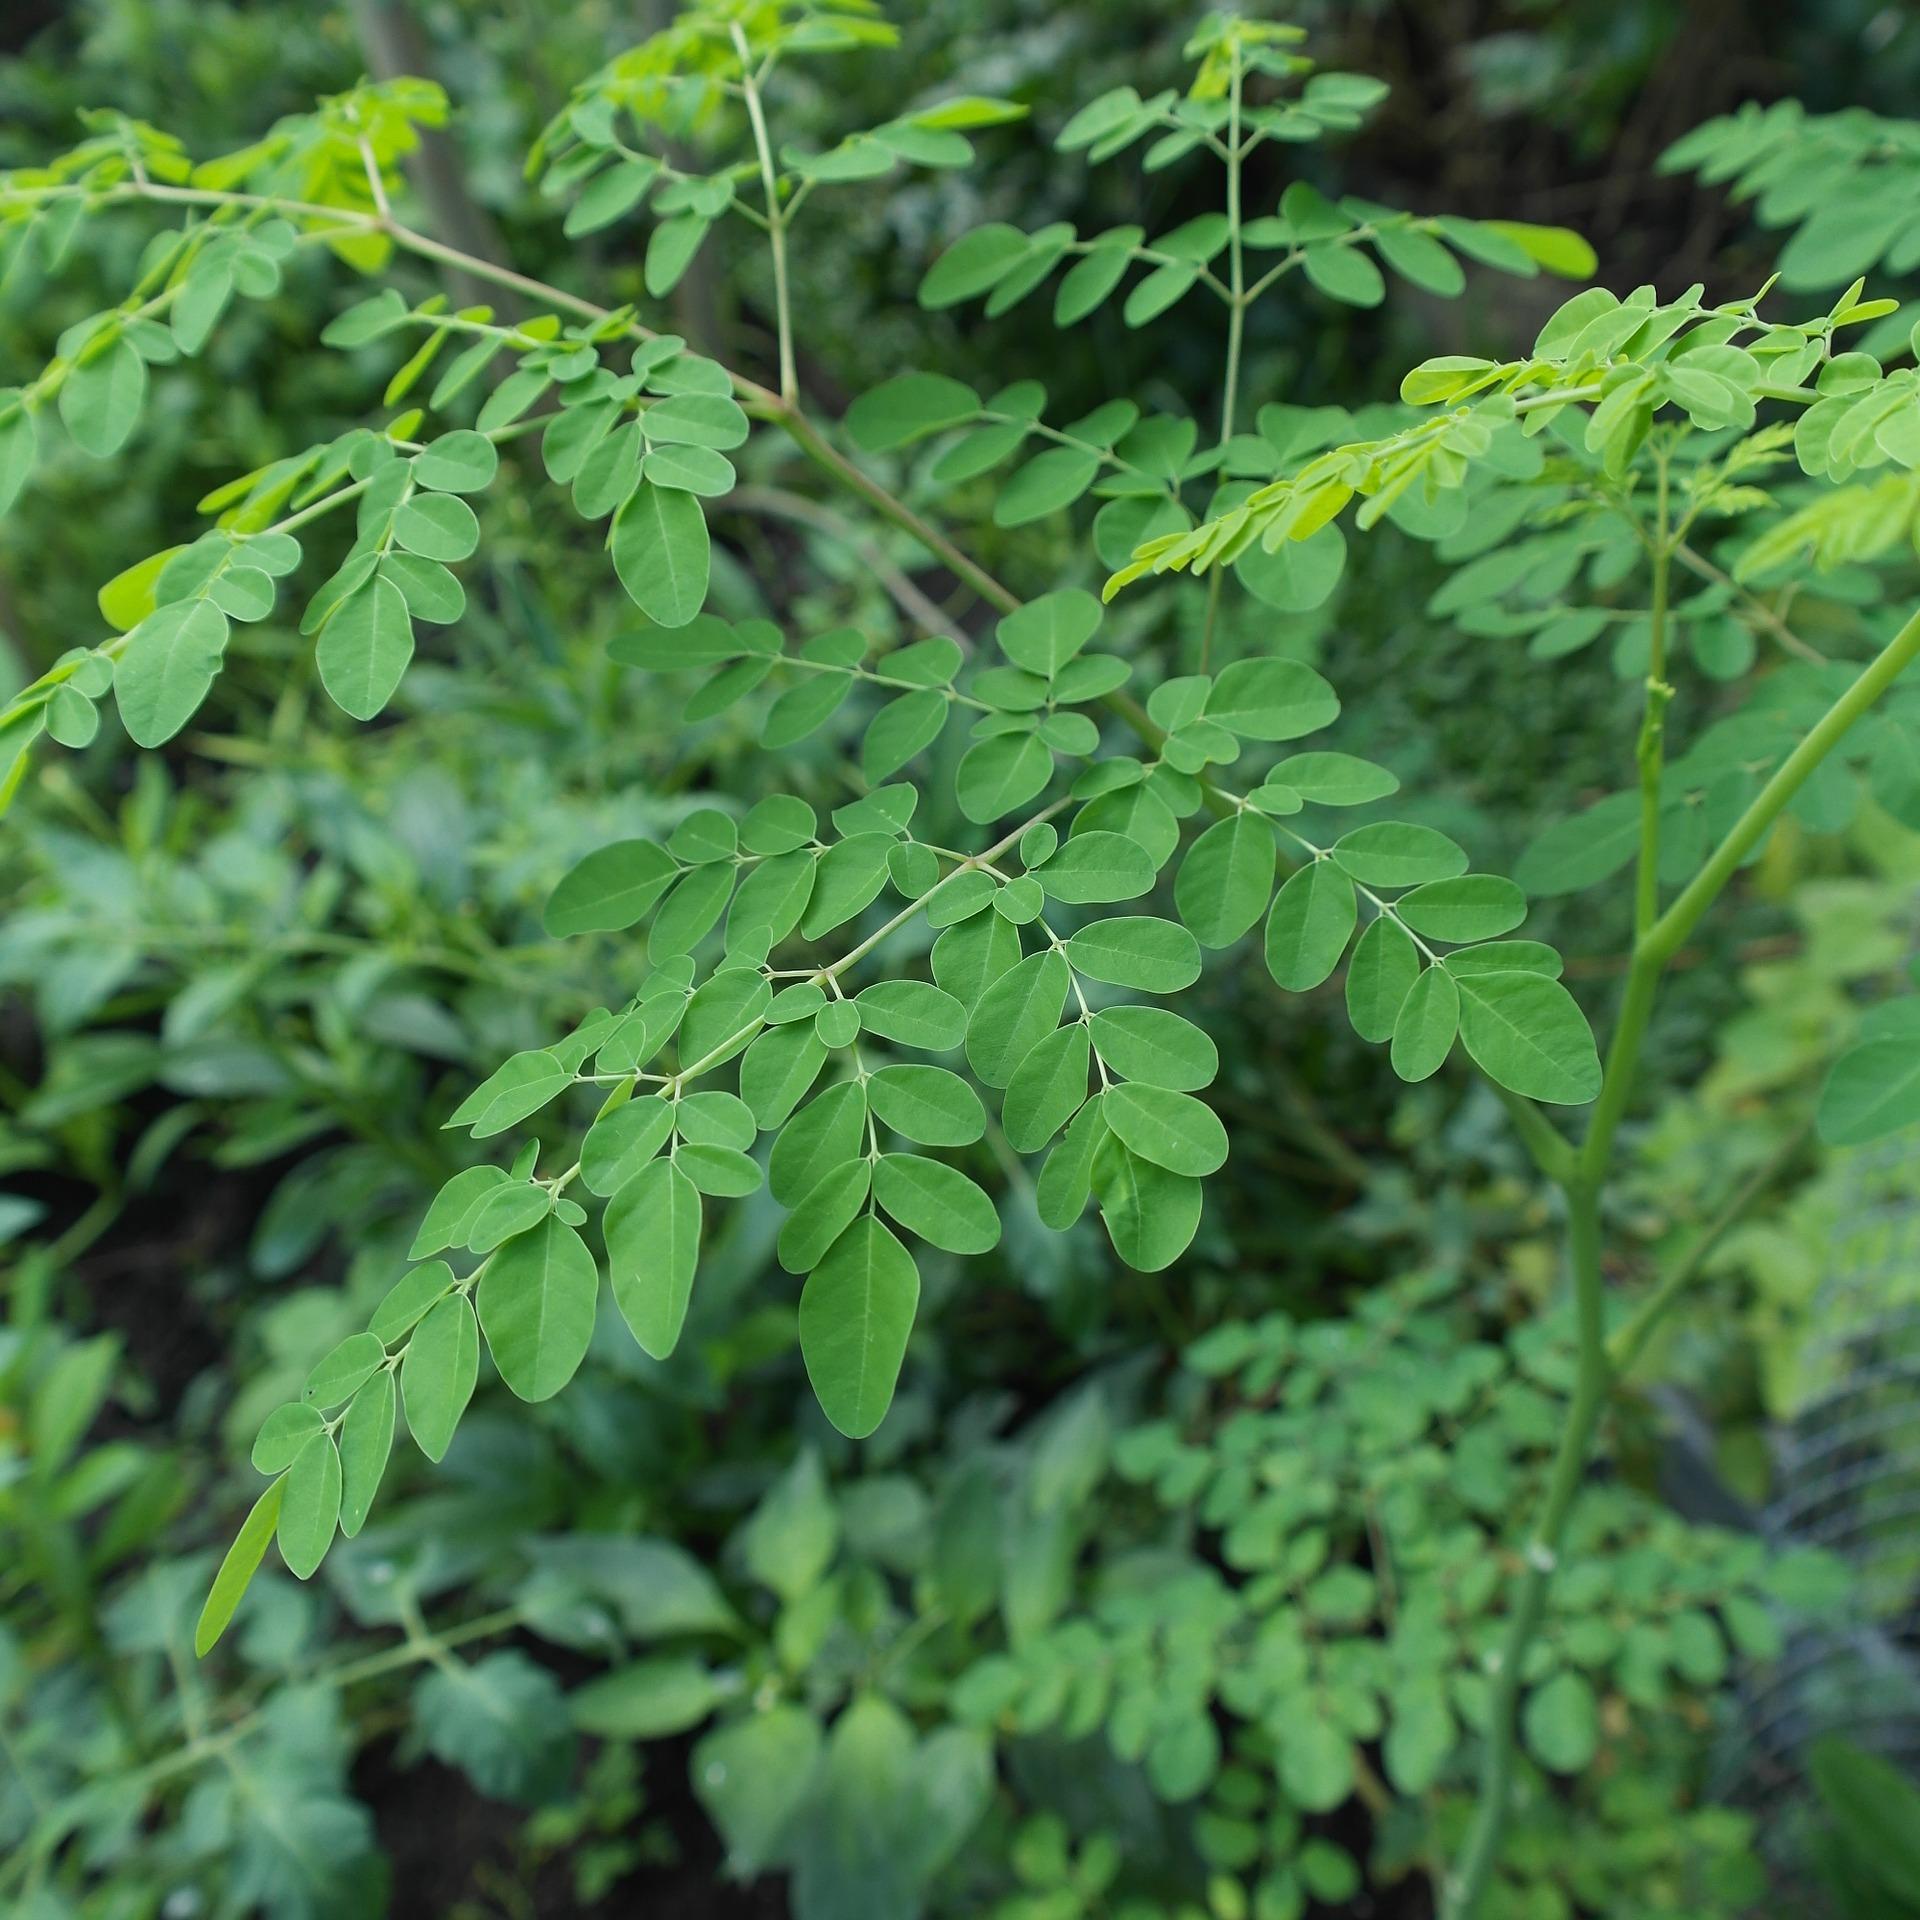 Comment utiliser le moringa ? Petites feuilles de moringa